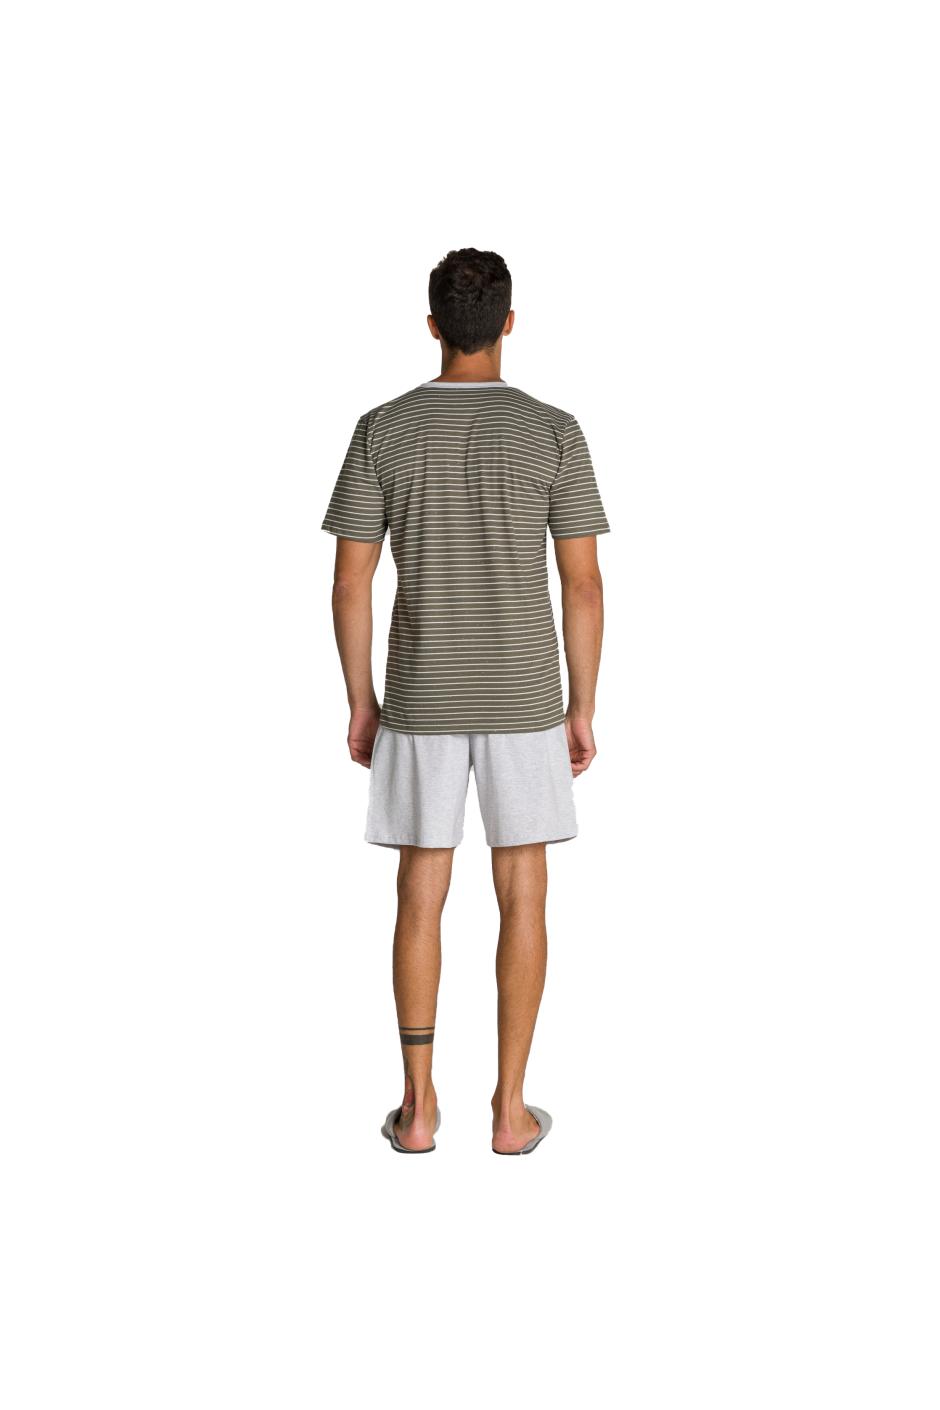 007/A - Pijama Adulto Masculino Pai e Filhos Botonê Listrado